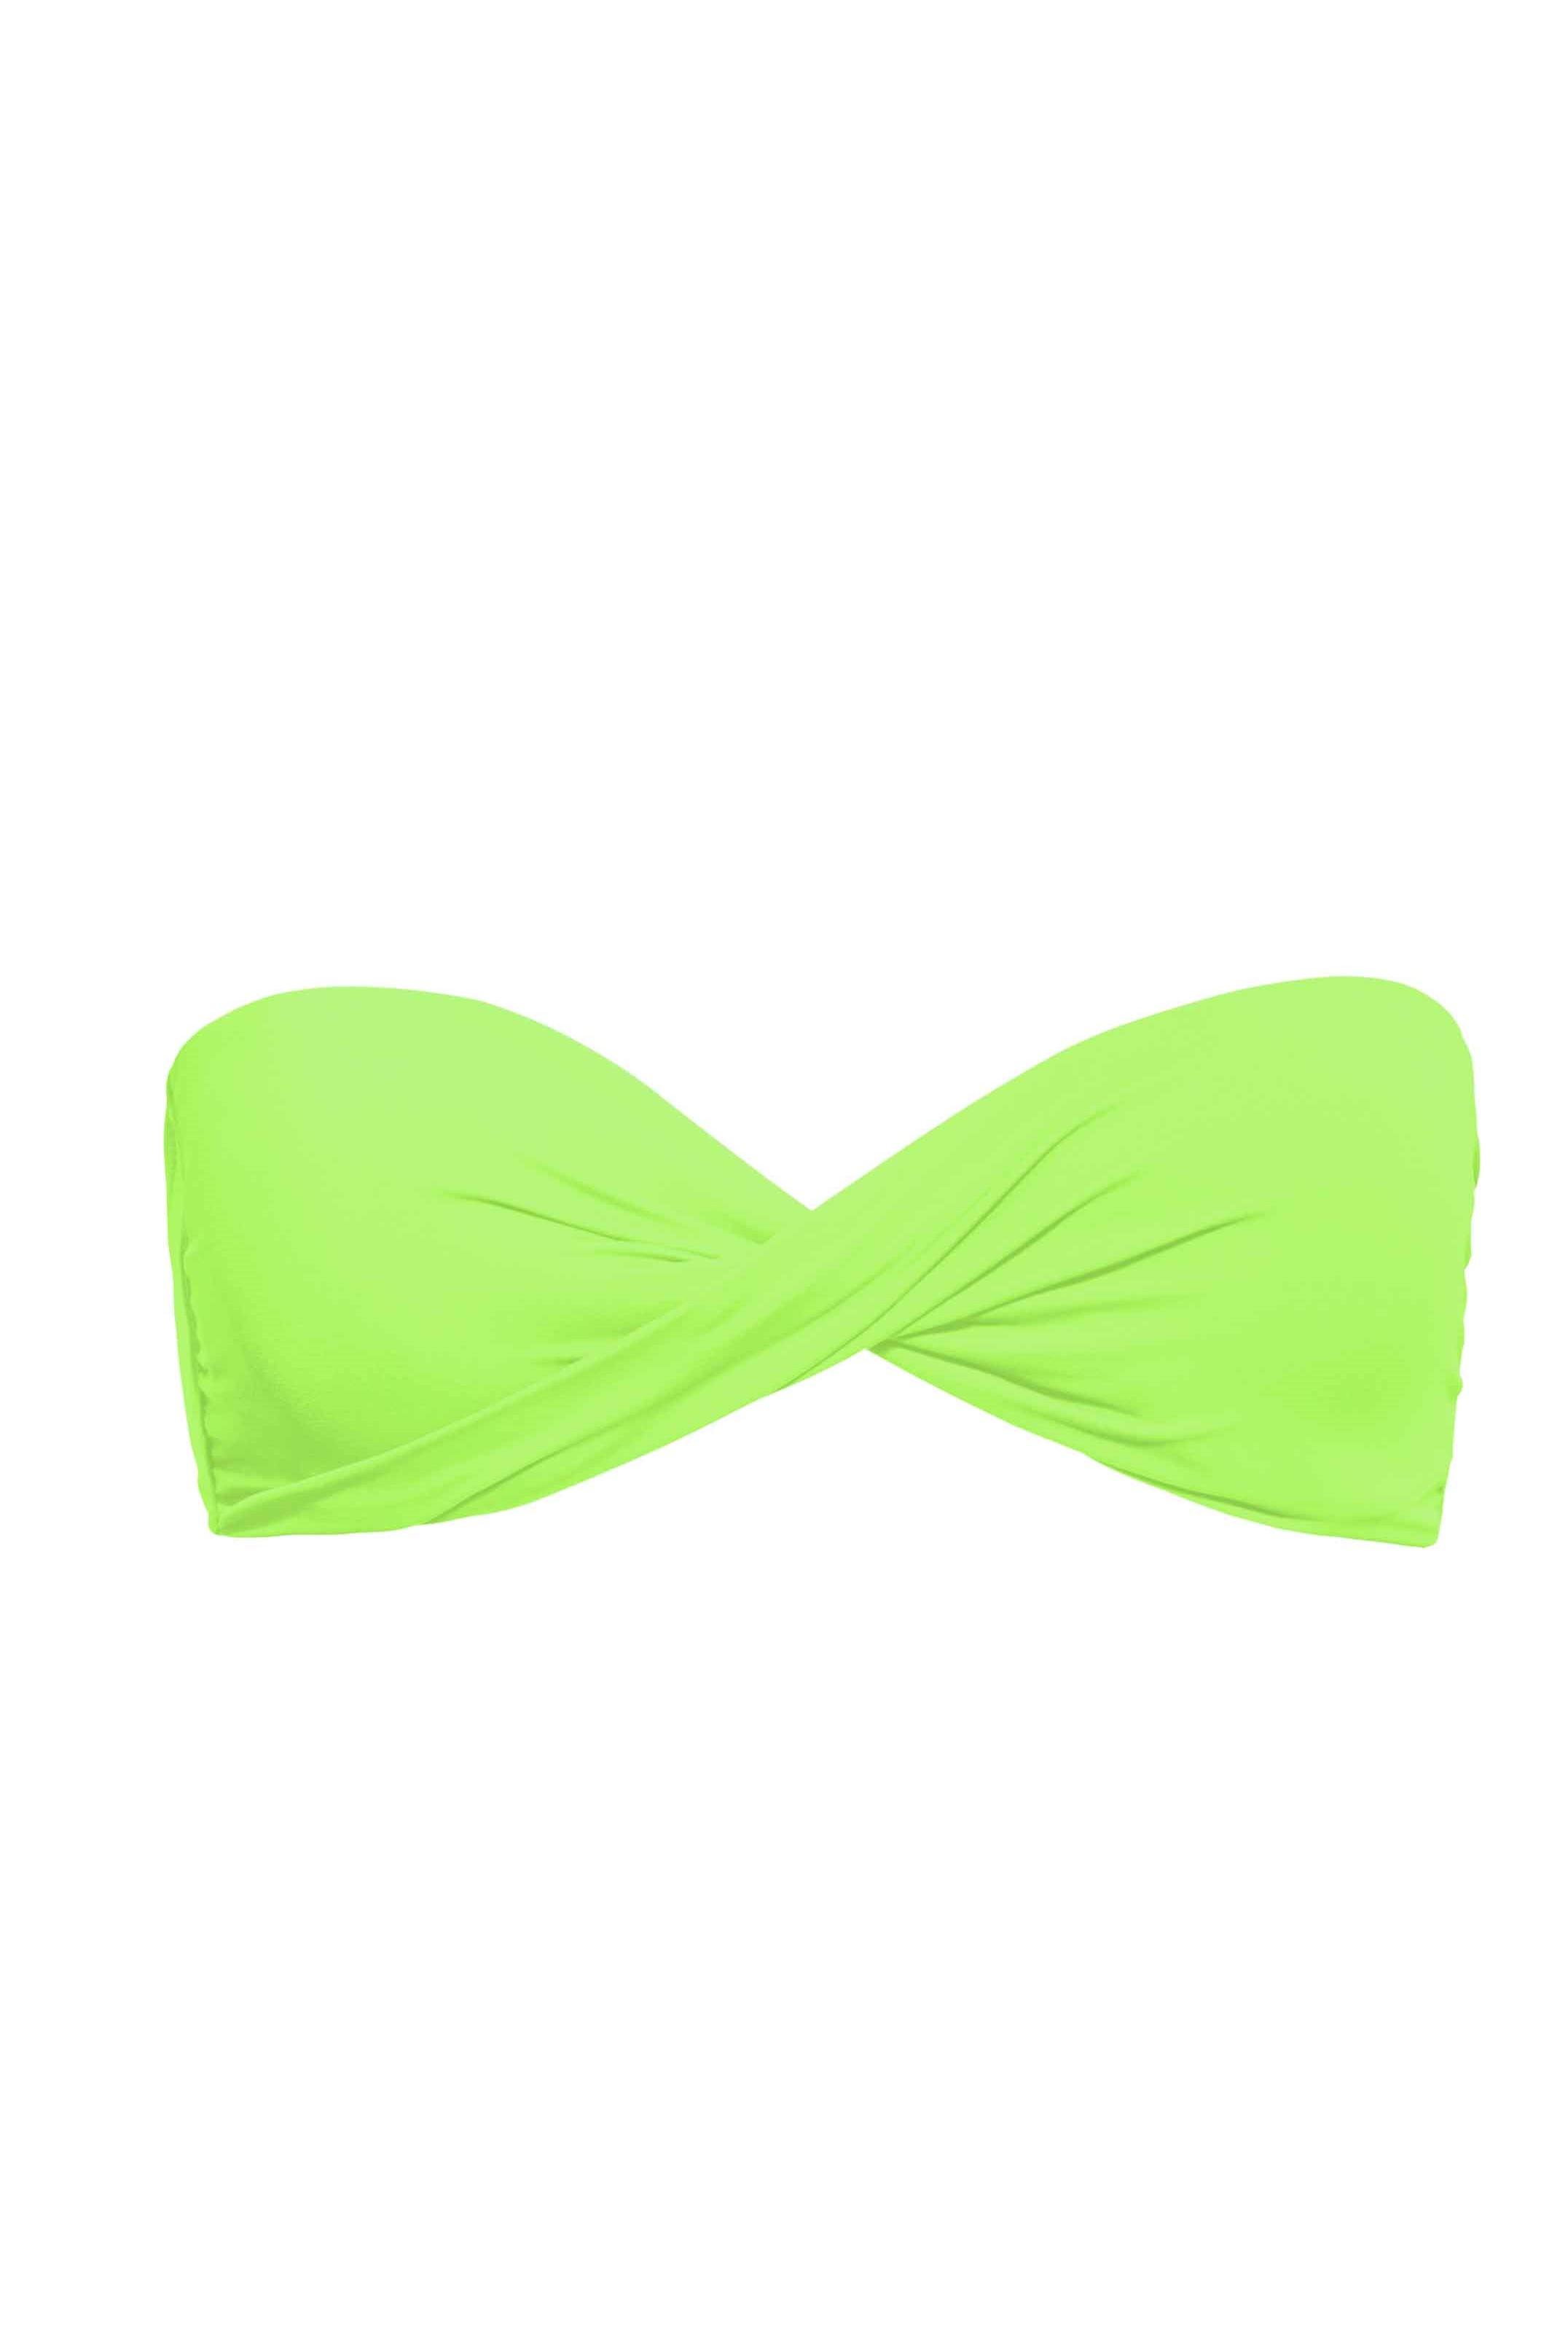 Phax Color Mix Strapless Twist Bikini Top Neon Green-extralarge-Neon Groen